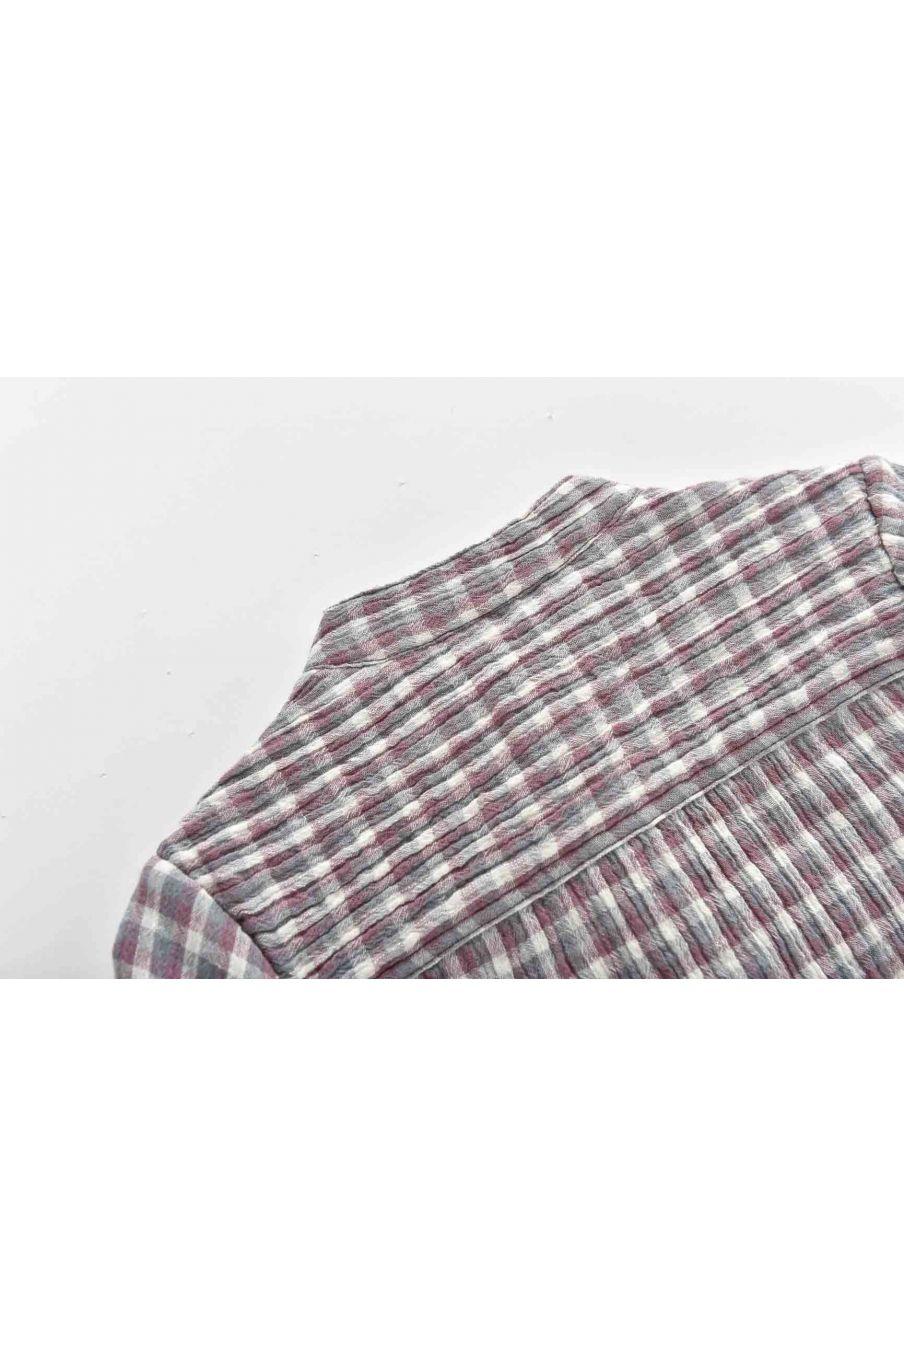 chemise bebe garcon akir parma & sauge check - louise misha